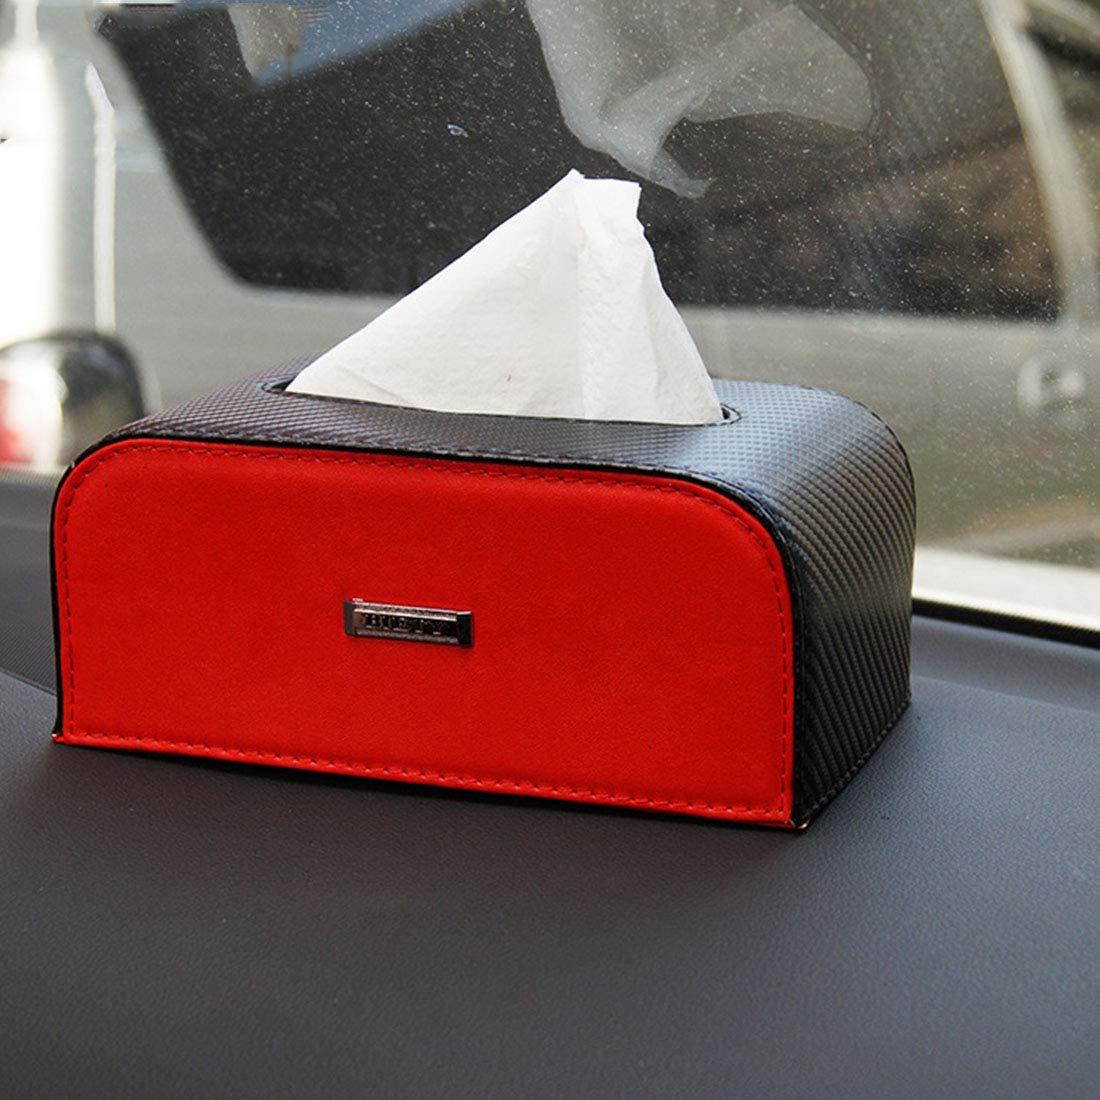 Cvthfyk EF Boîte à mouchoirs créative Boîte à mouchoirs en Cuir Panneau de Bord Boîte à mouchoirs Boîte à mouchoirs (Color : Black and White)